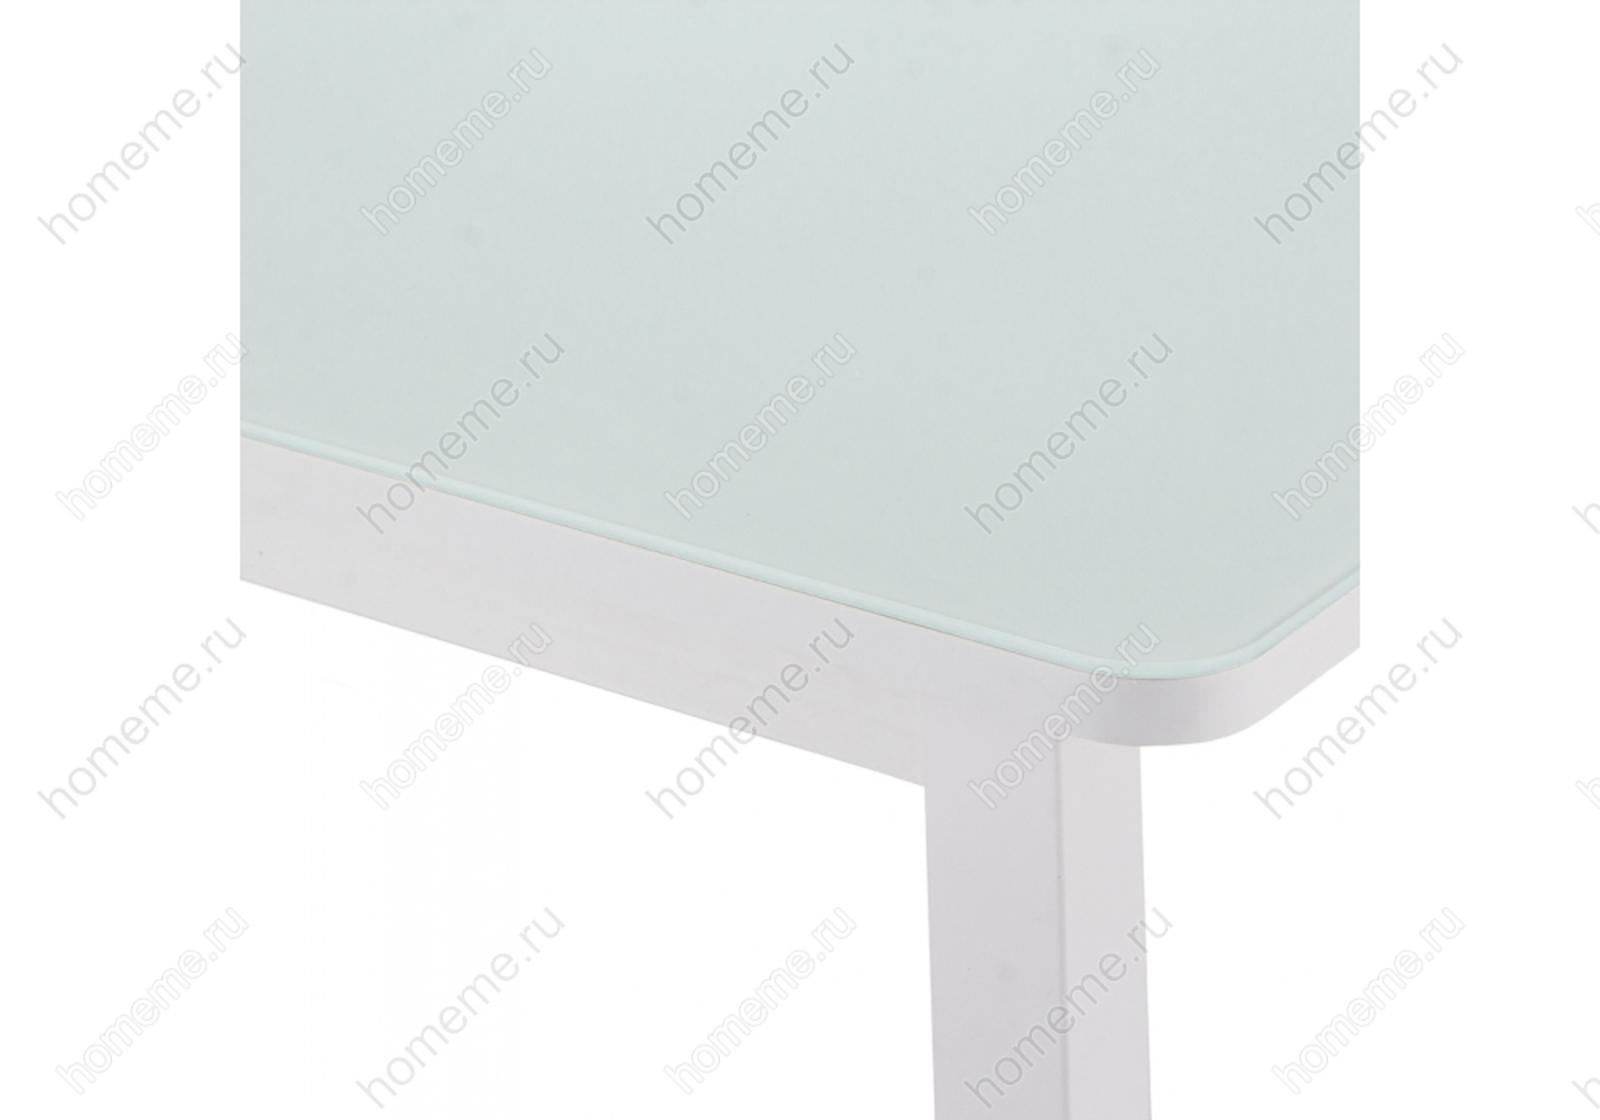 Стол стеклянный со стеклом Ланс 130 белый 302727 со стеклом Ланс 130 белый 302727 (15317)